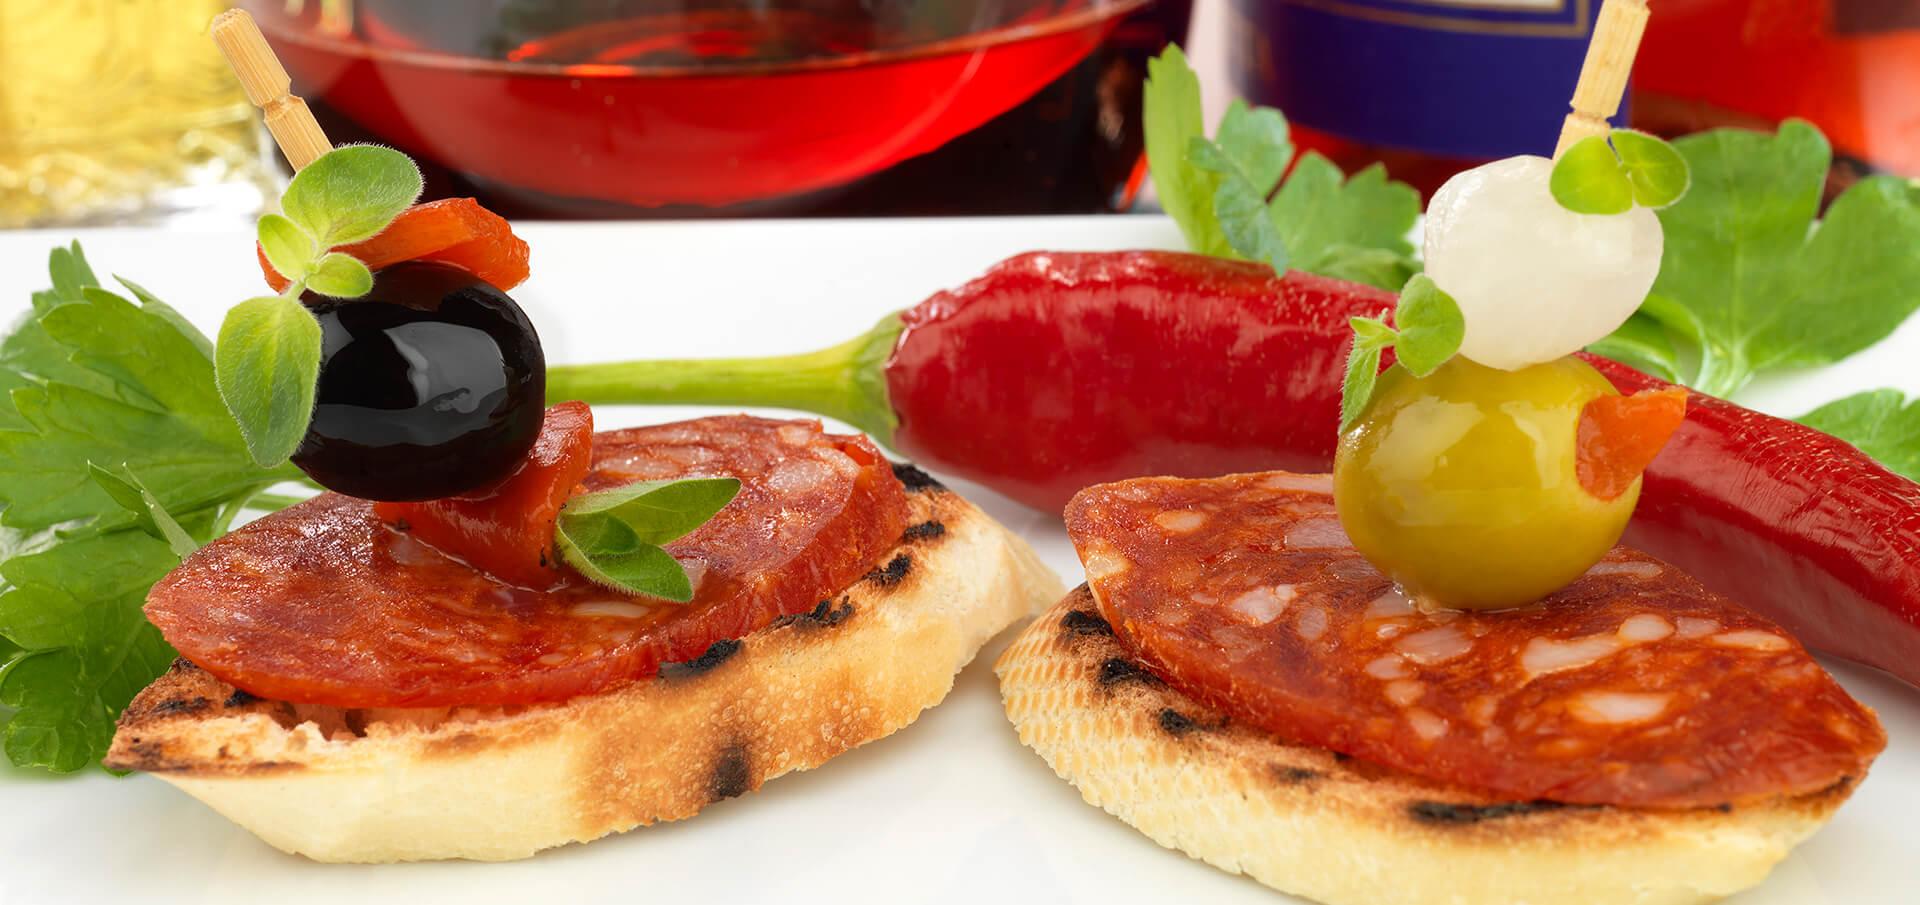 Salsiccia piccante Menatti